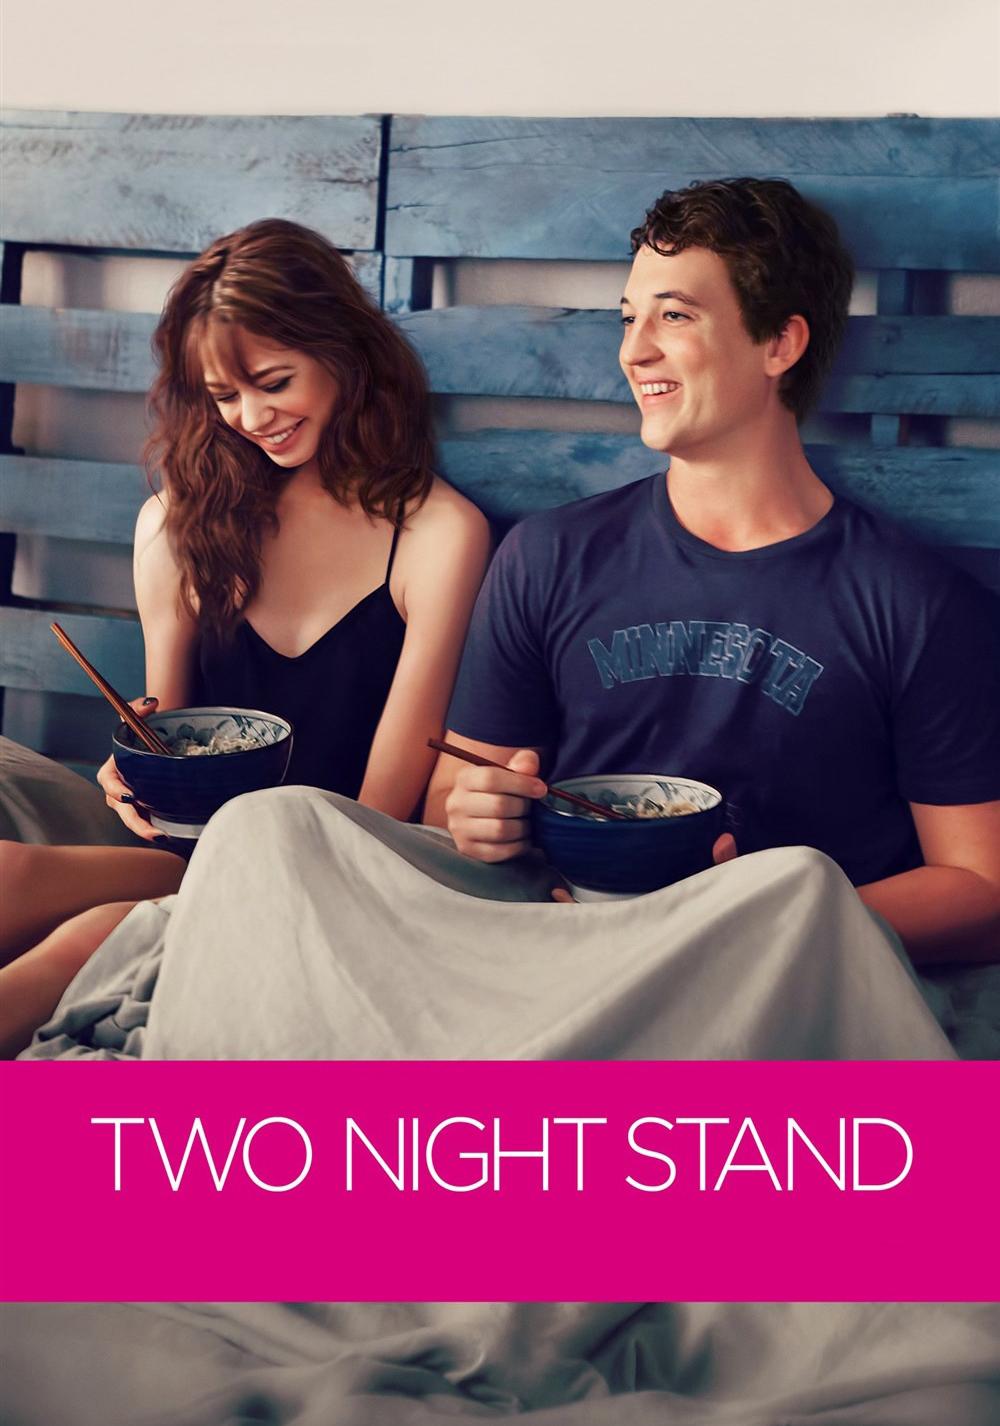 On Night Stand